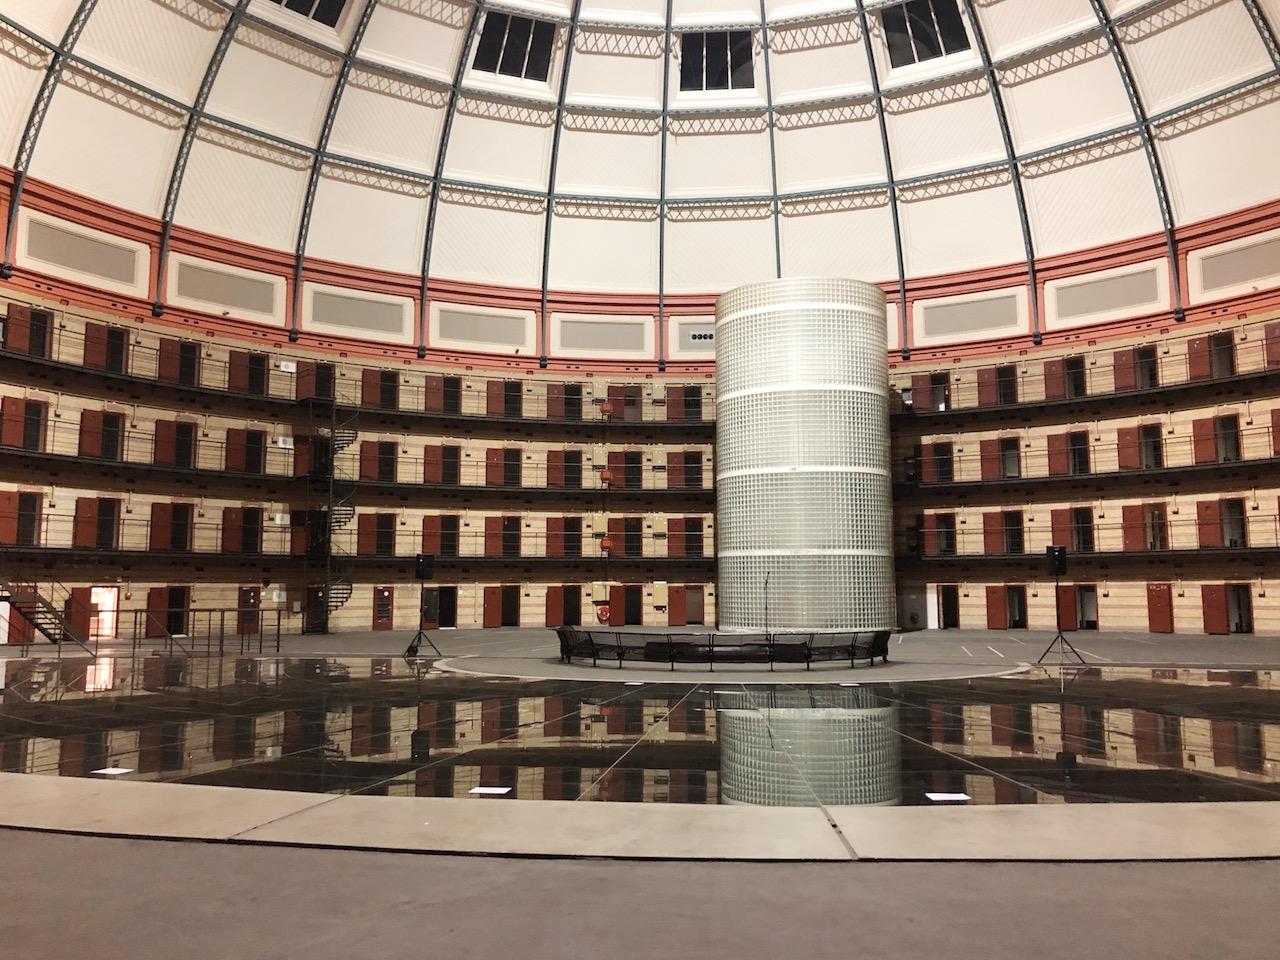 De Koepel, Prison Escape, Week 10, Maart 2020